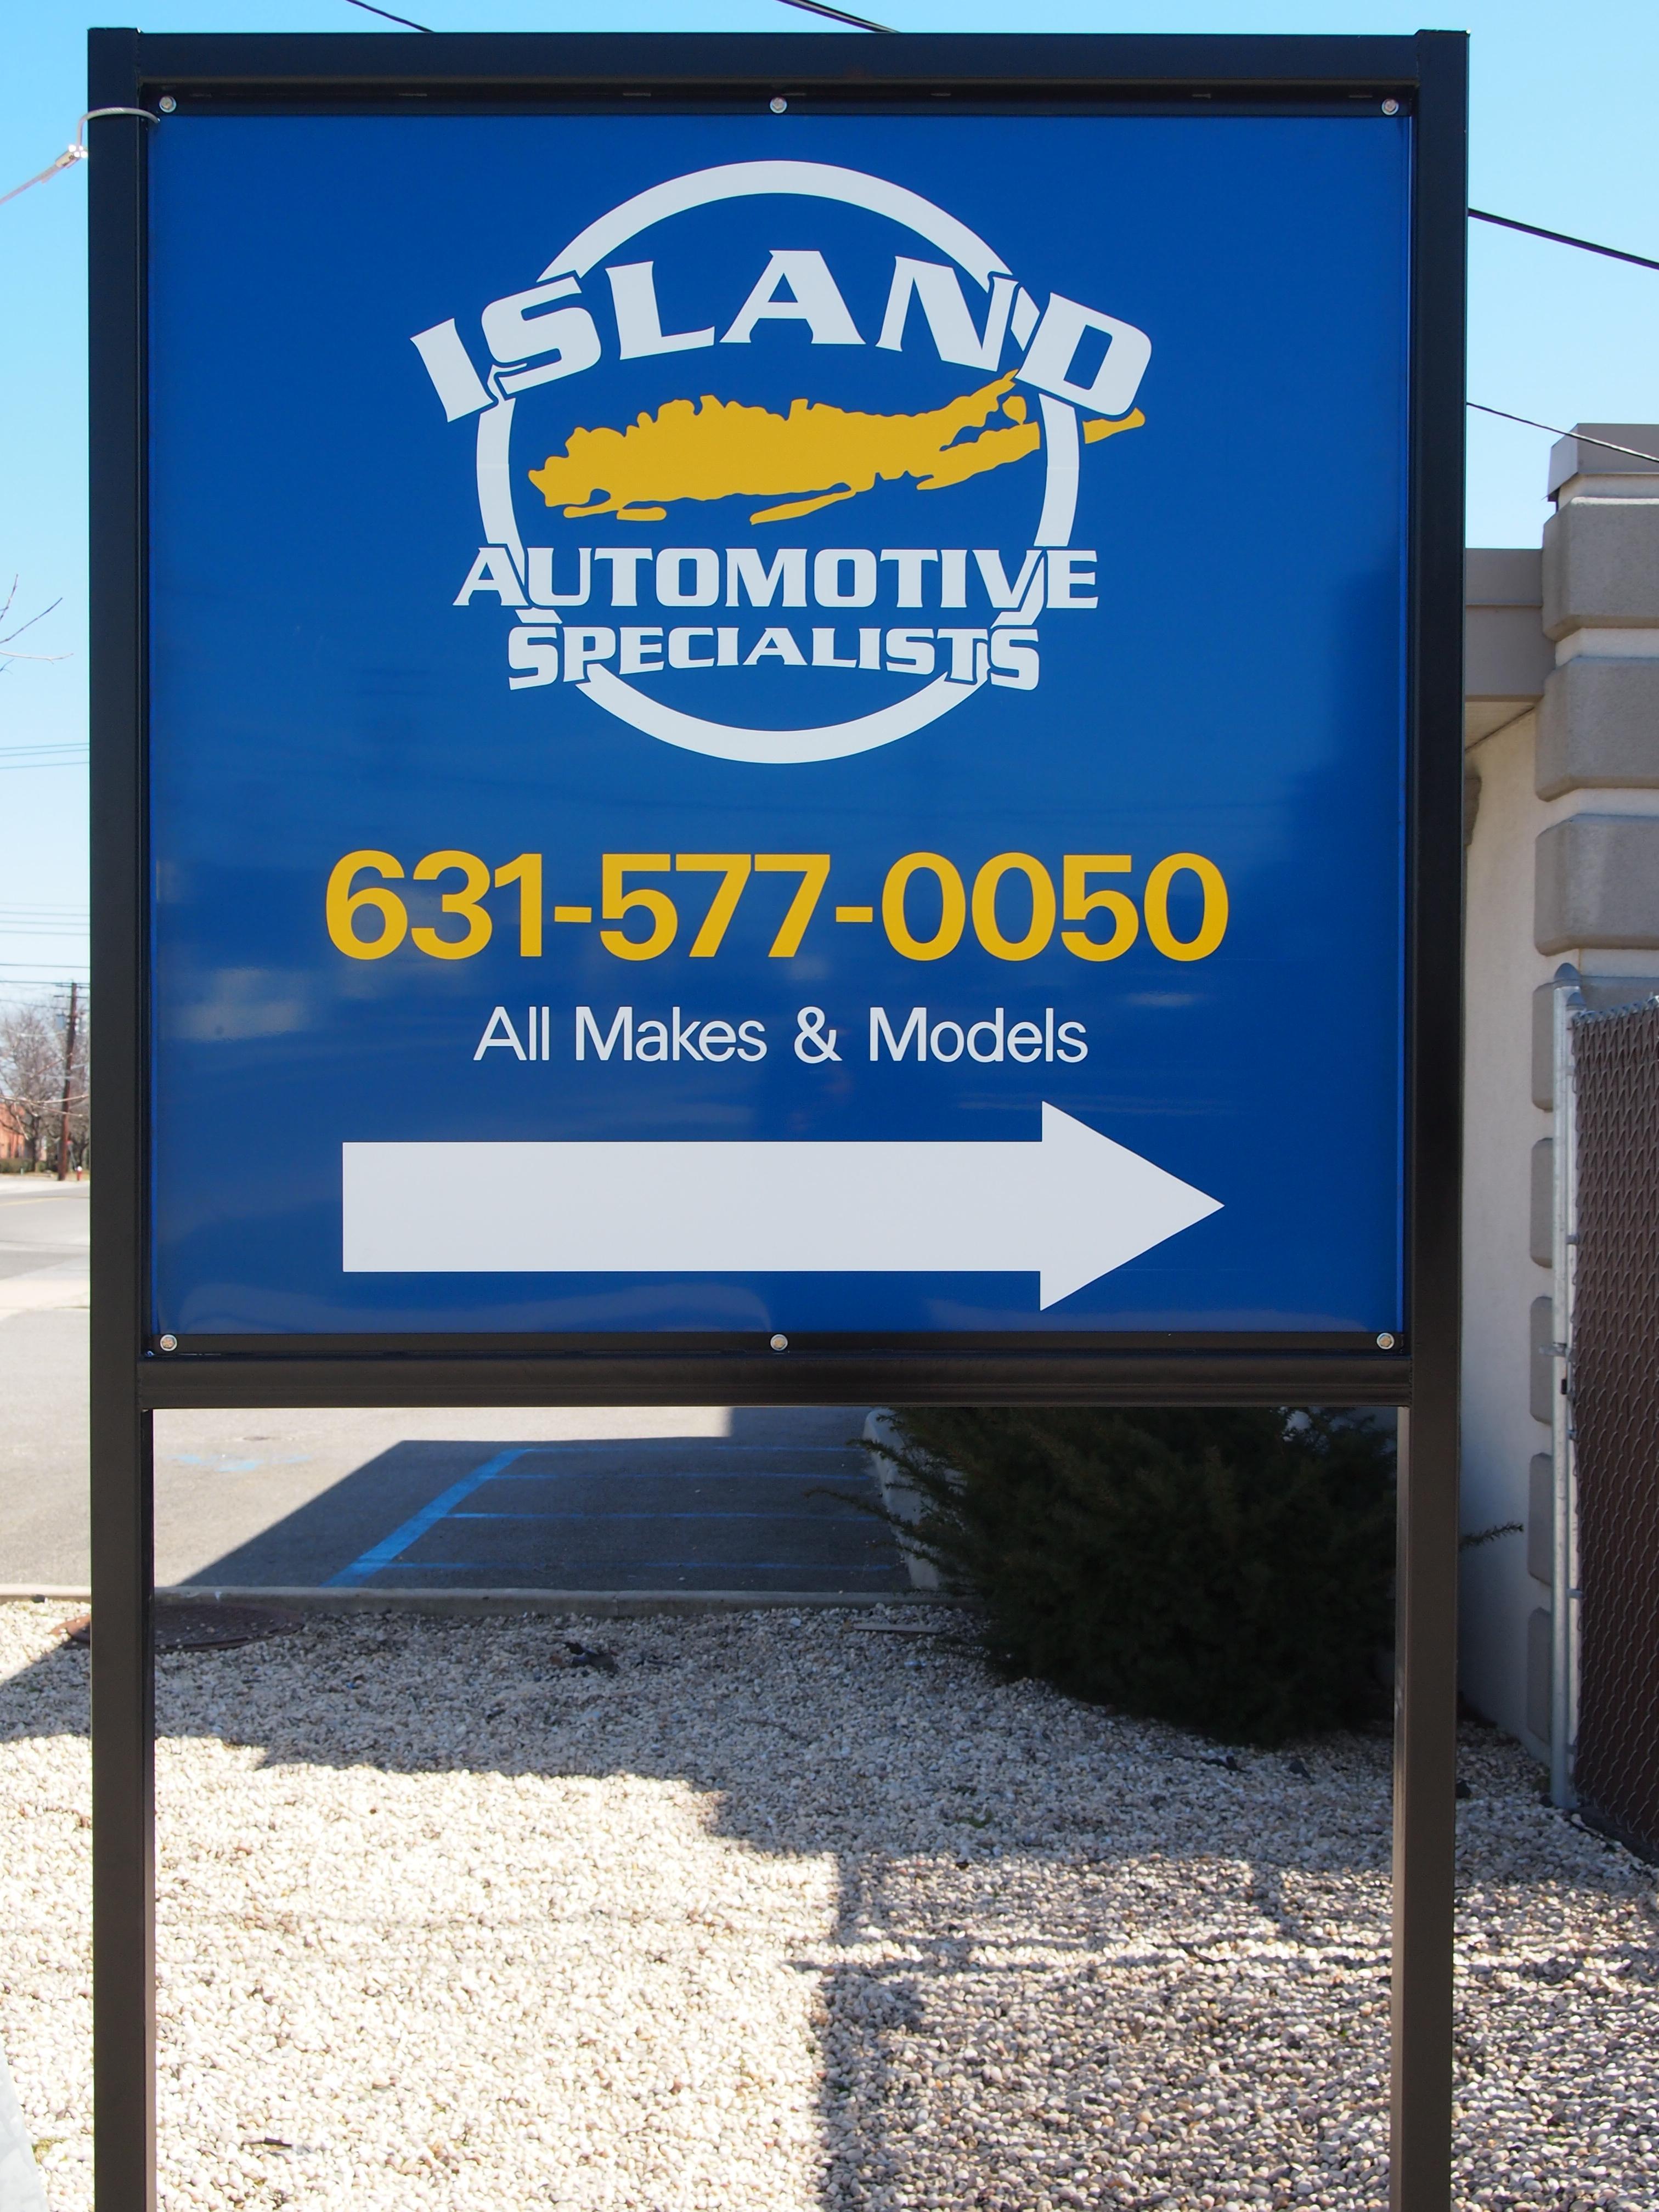 Island automotive specialists